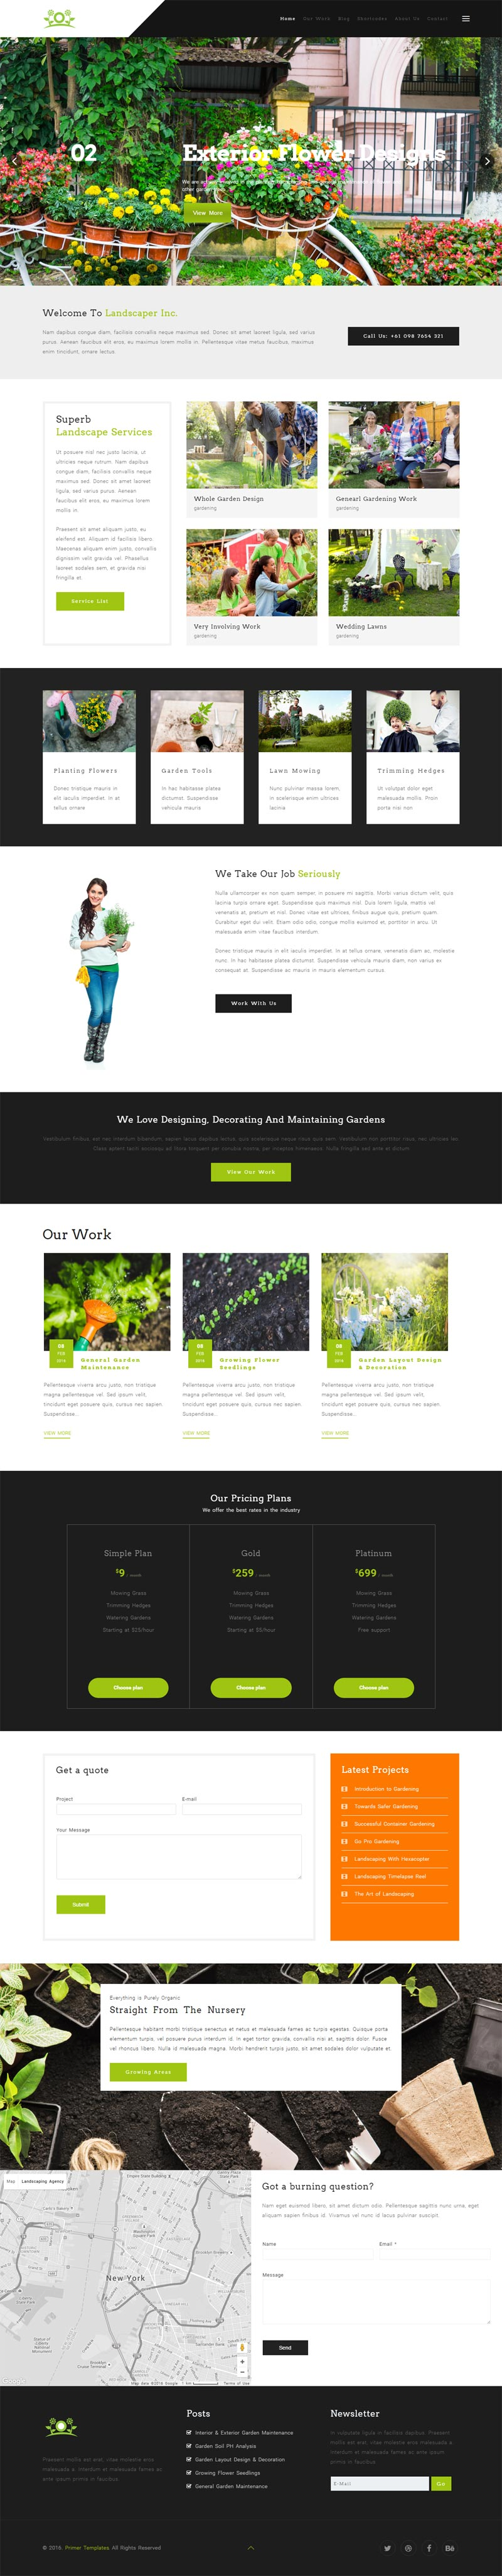 Main home page Joomla! template